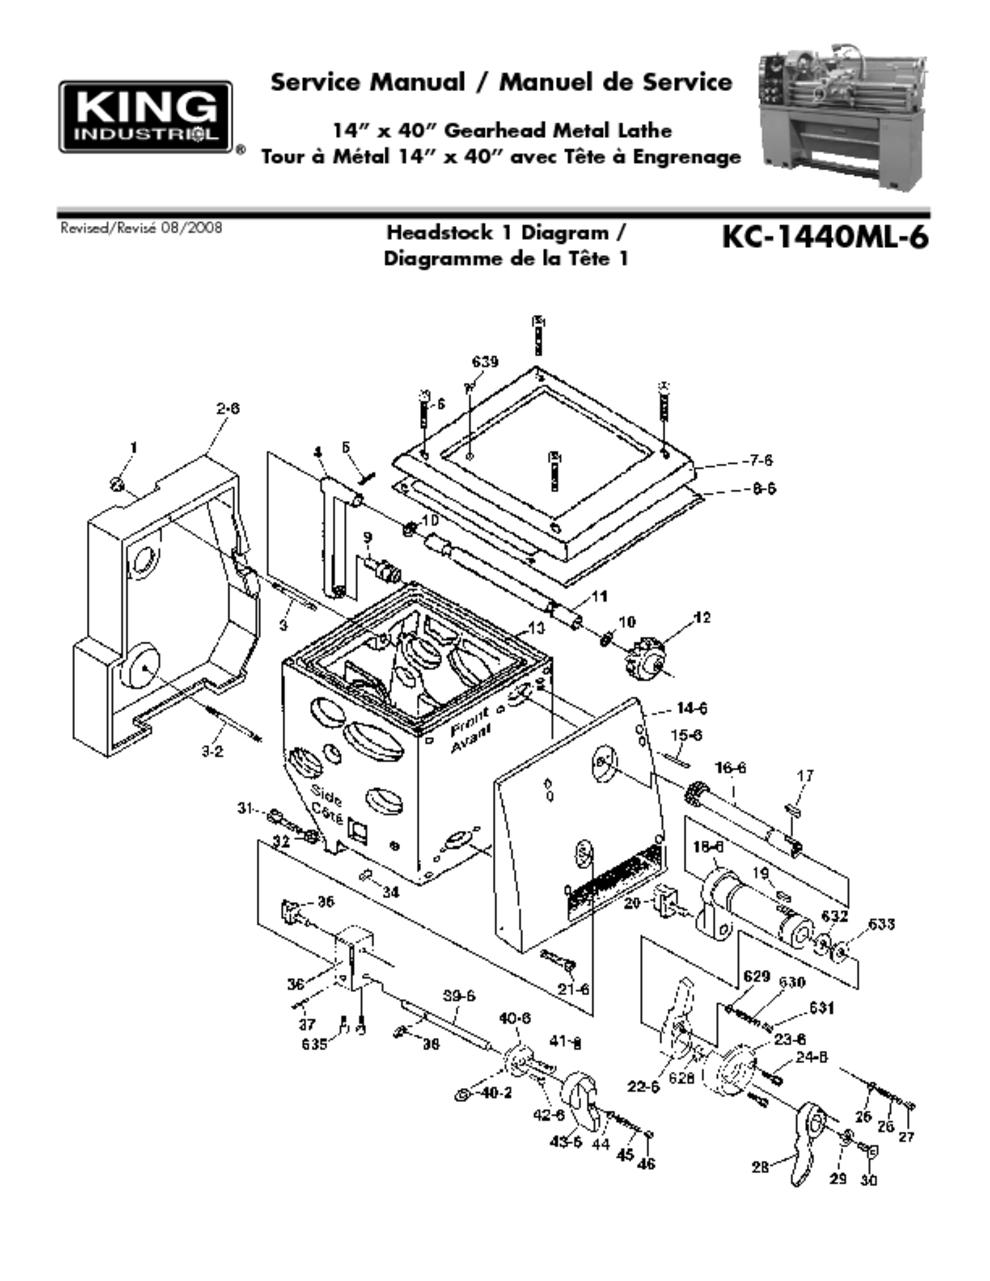 Tige Wiring Diagram -04 Ford F 150 Fuse Diagram Starter Fuse | Begeboy Wiring  Diagram SourceBegeboy Wiring Diagram Source